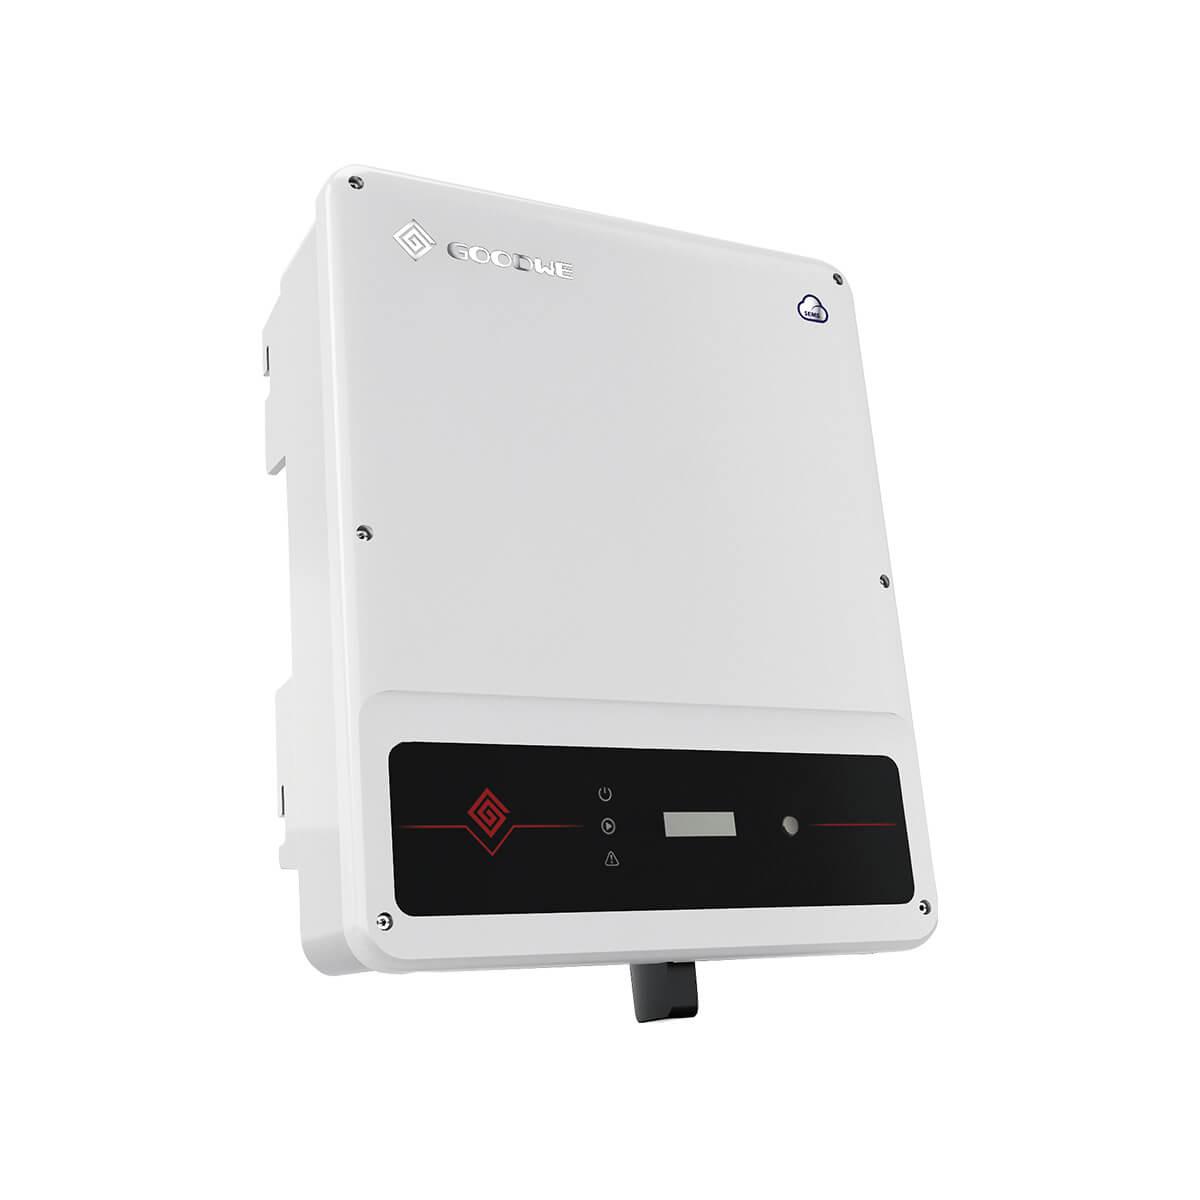 goodwe 6kW inverter, goodwe gw6k-dt 6kW inverter, goodwe gw6k-dt inverter, goodwe gw6k-dt, goodwe 6 kW